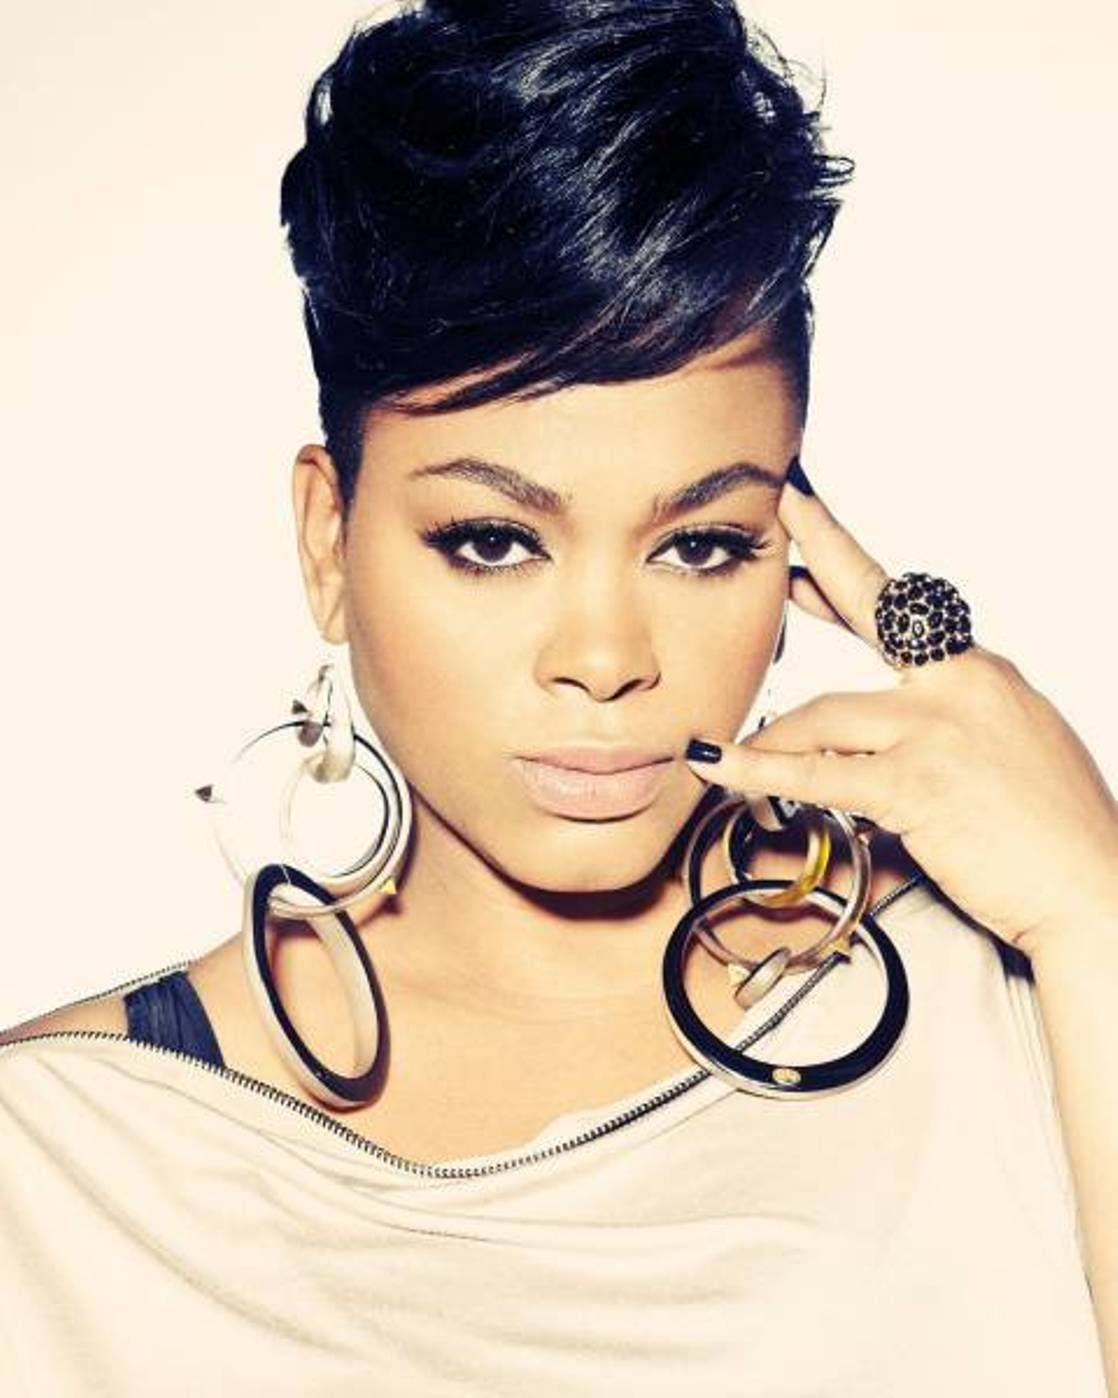 Astonishing 1000 Images About Short Hair Cut On Pinterest Short Hairstyles Short Hairstyles For Black Women Fulllsitofus